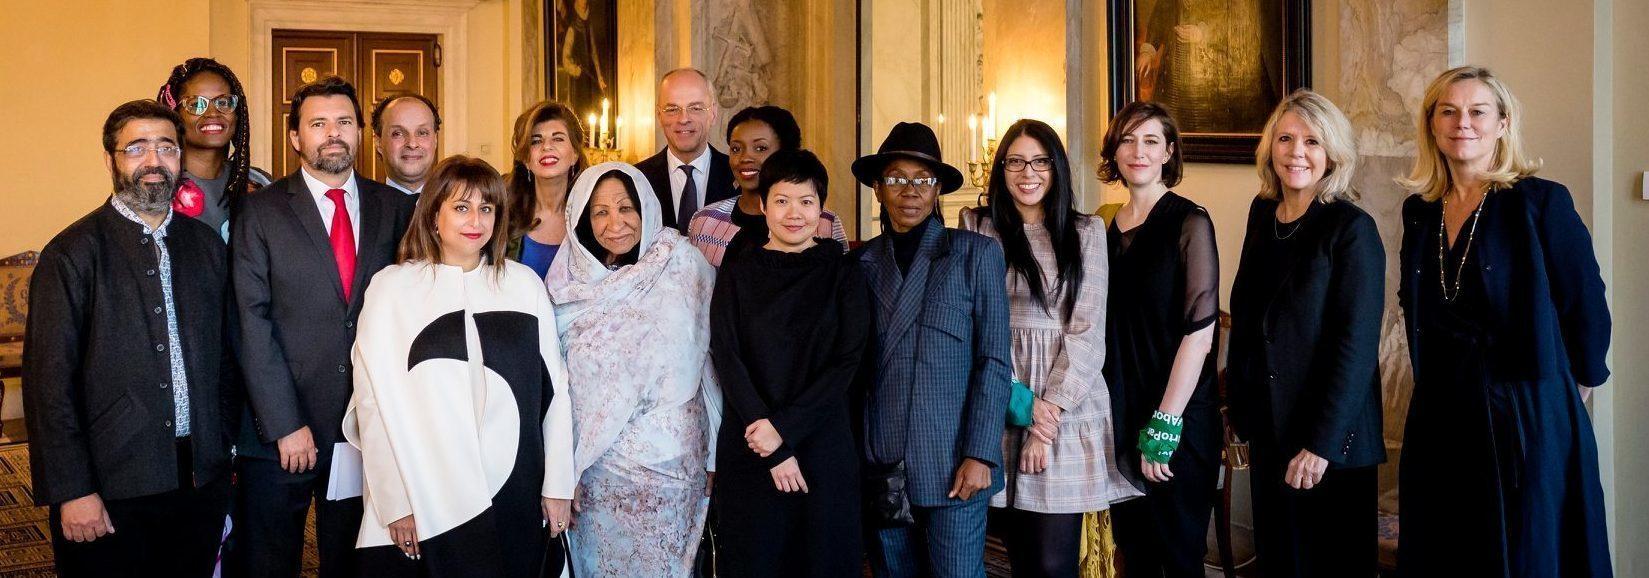 2019 President of the Senate Minister Awards Committee Laureates Royal Palace c Frank van Beek